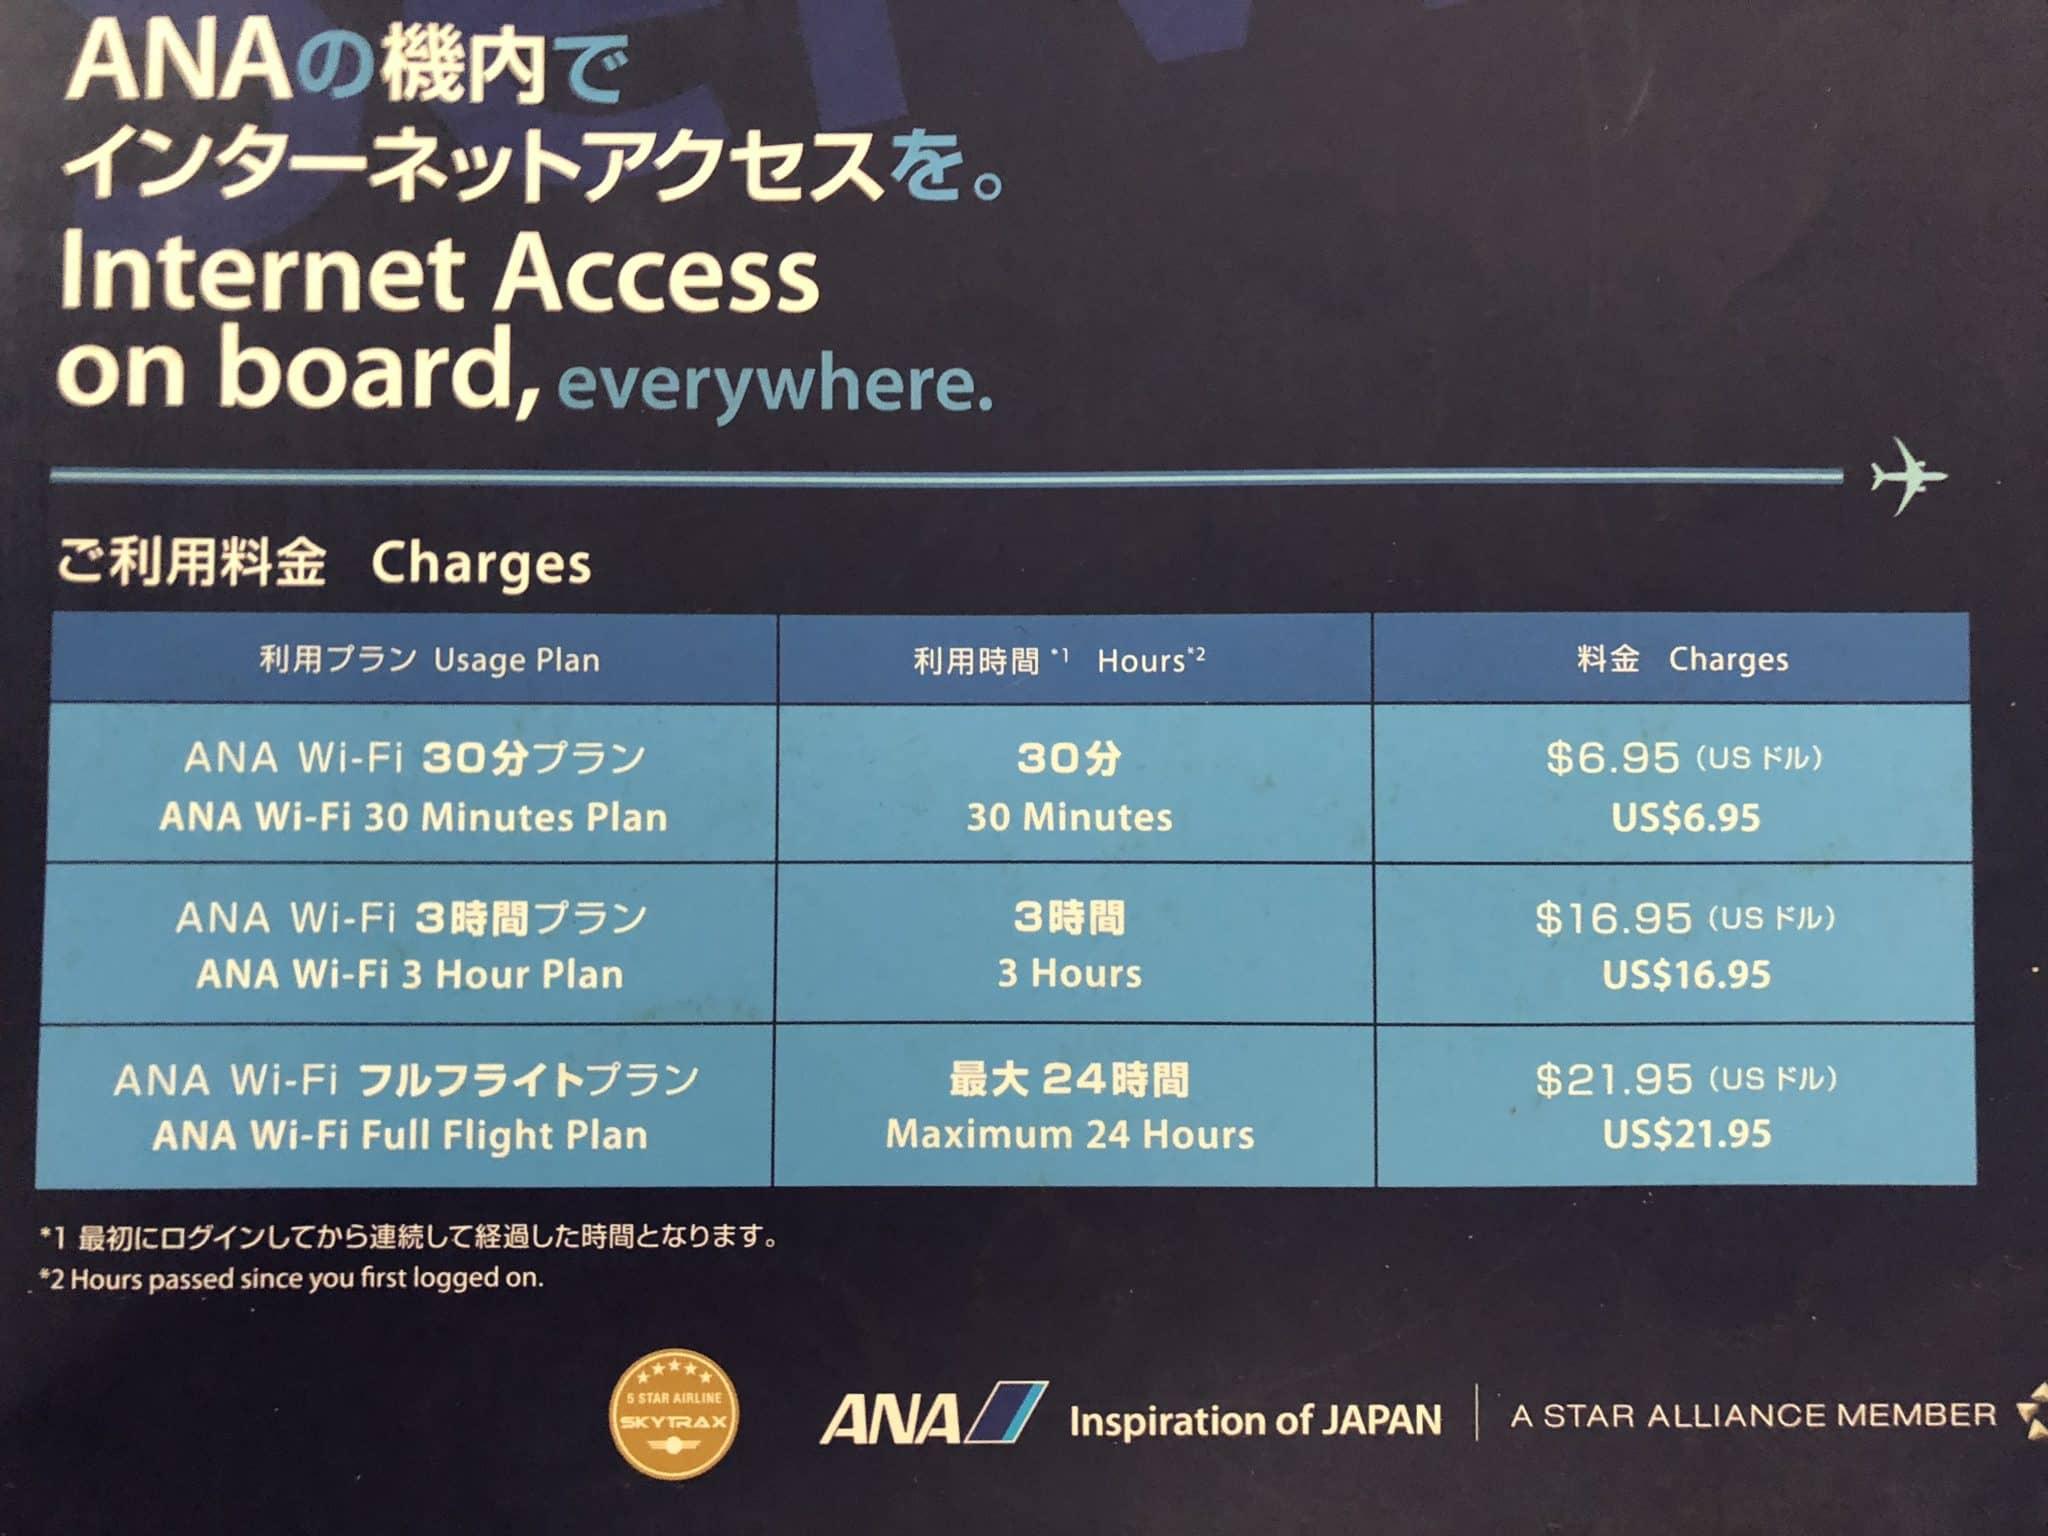 ANA Business Class B787-9 Internet on Board